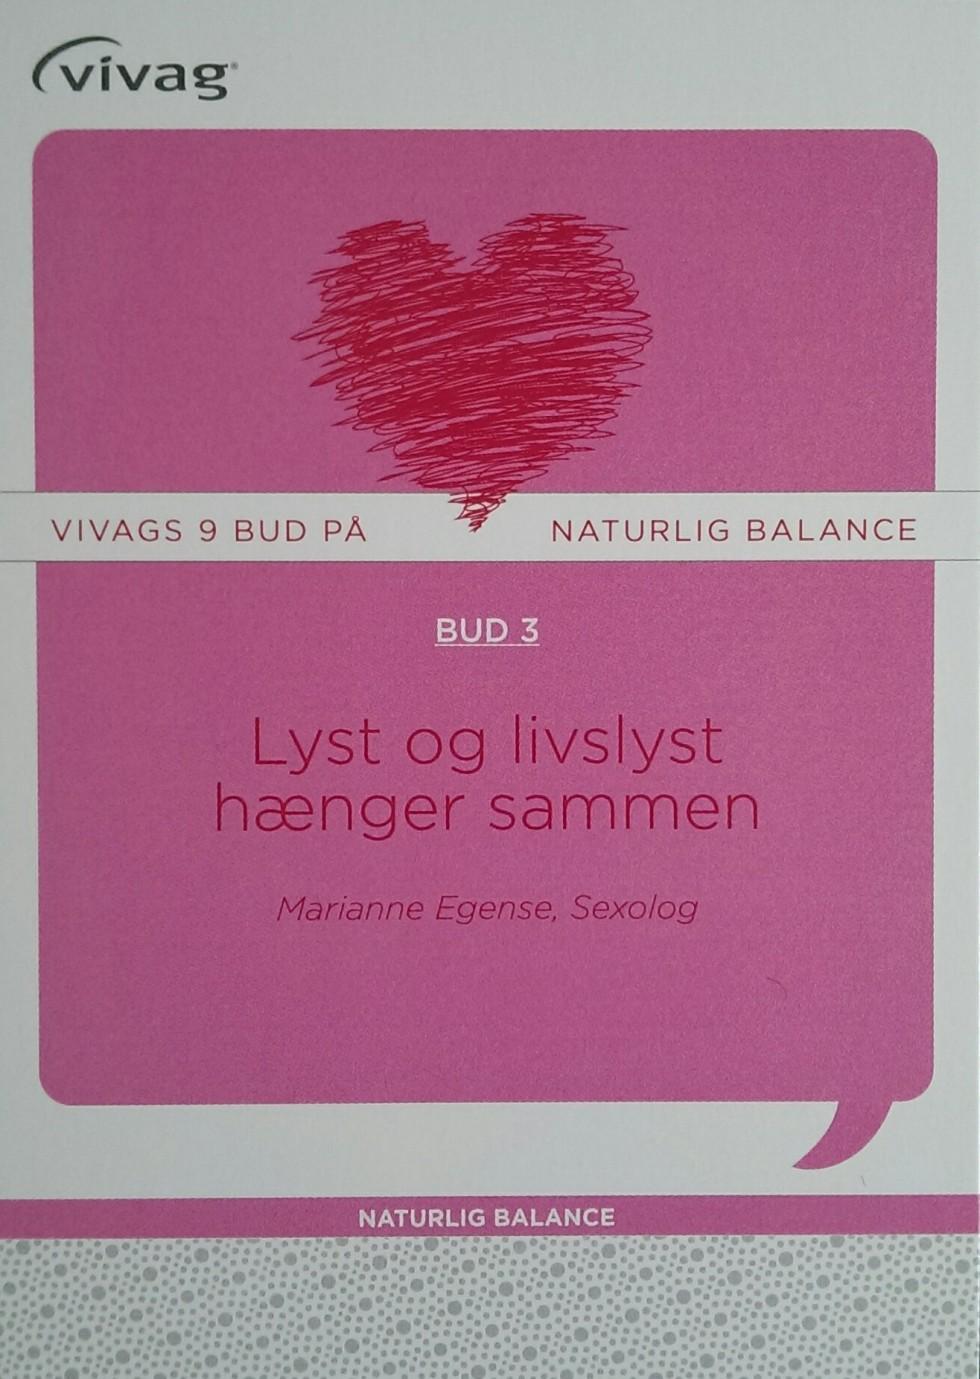 vivag_naturlig balance